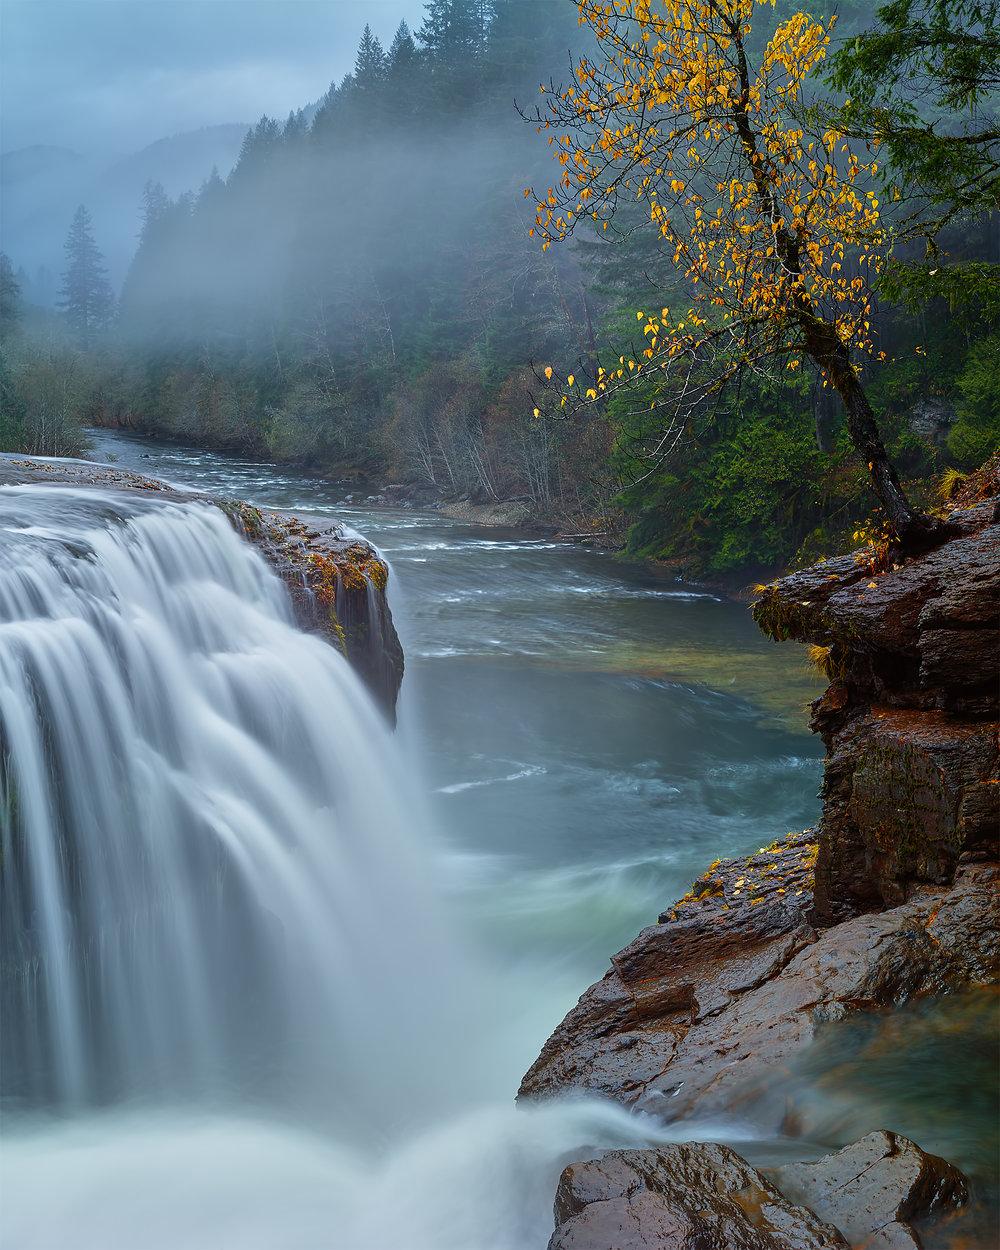 Gifford Pinchot National Forest, Oregon